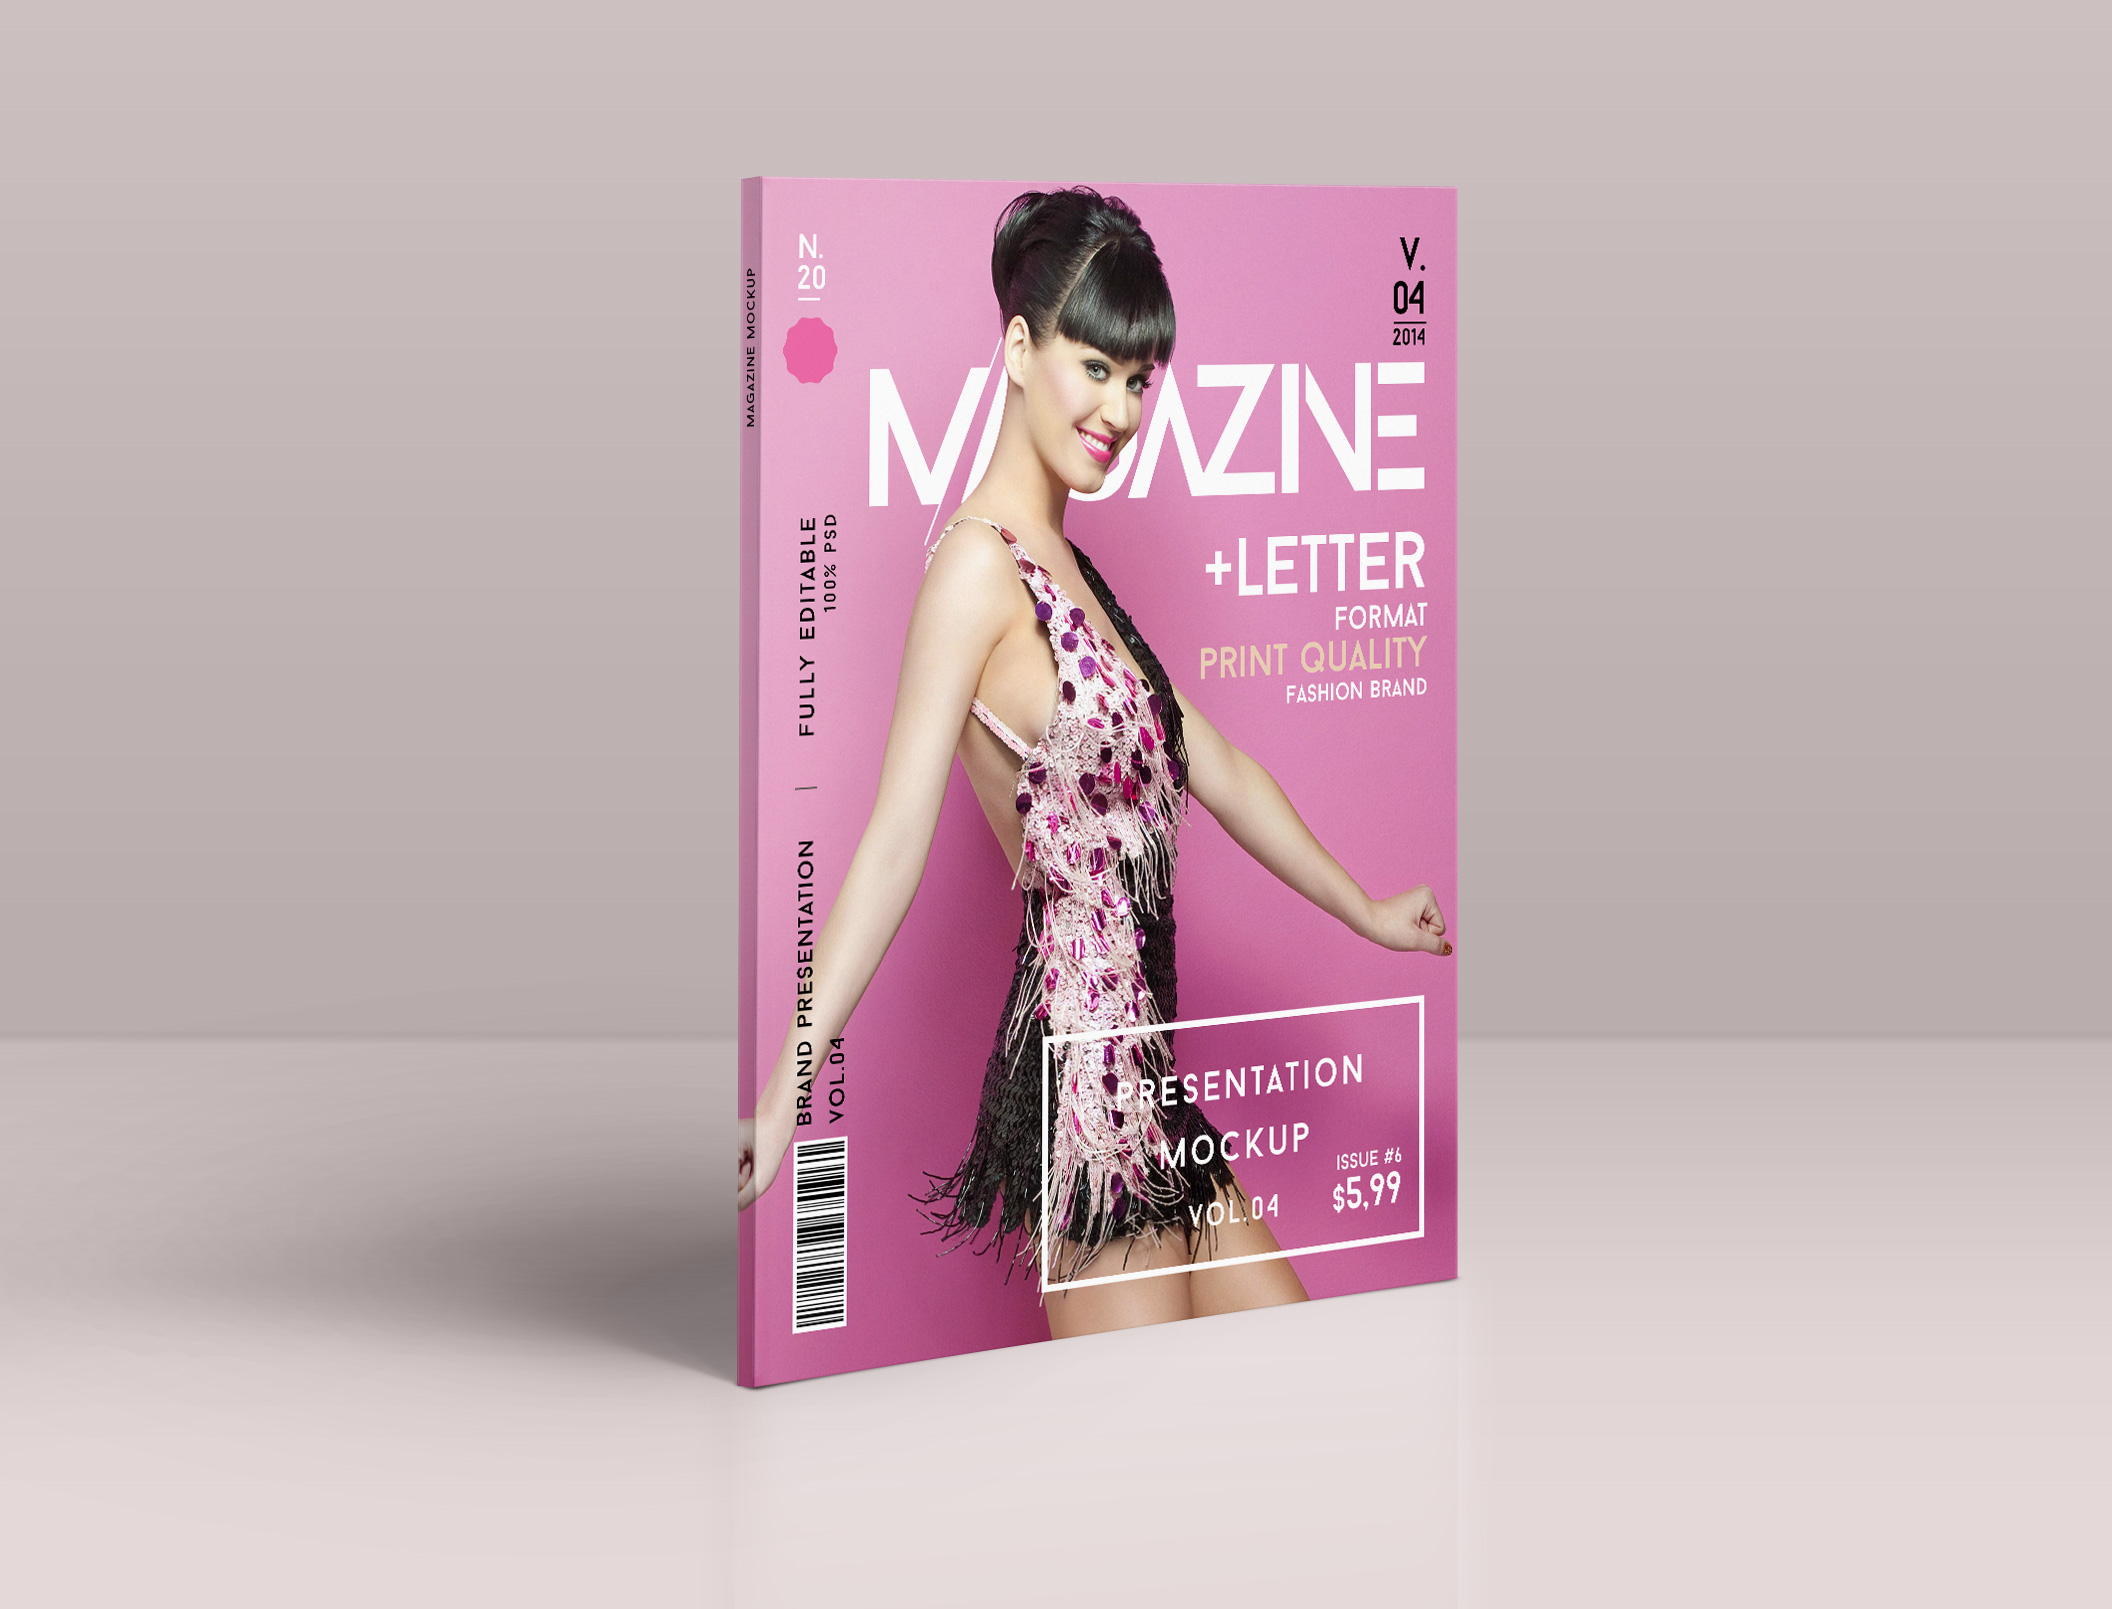 magazine-presentation-mockup-vol4